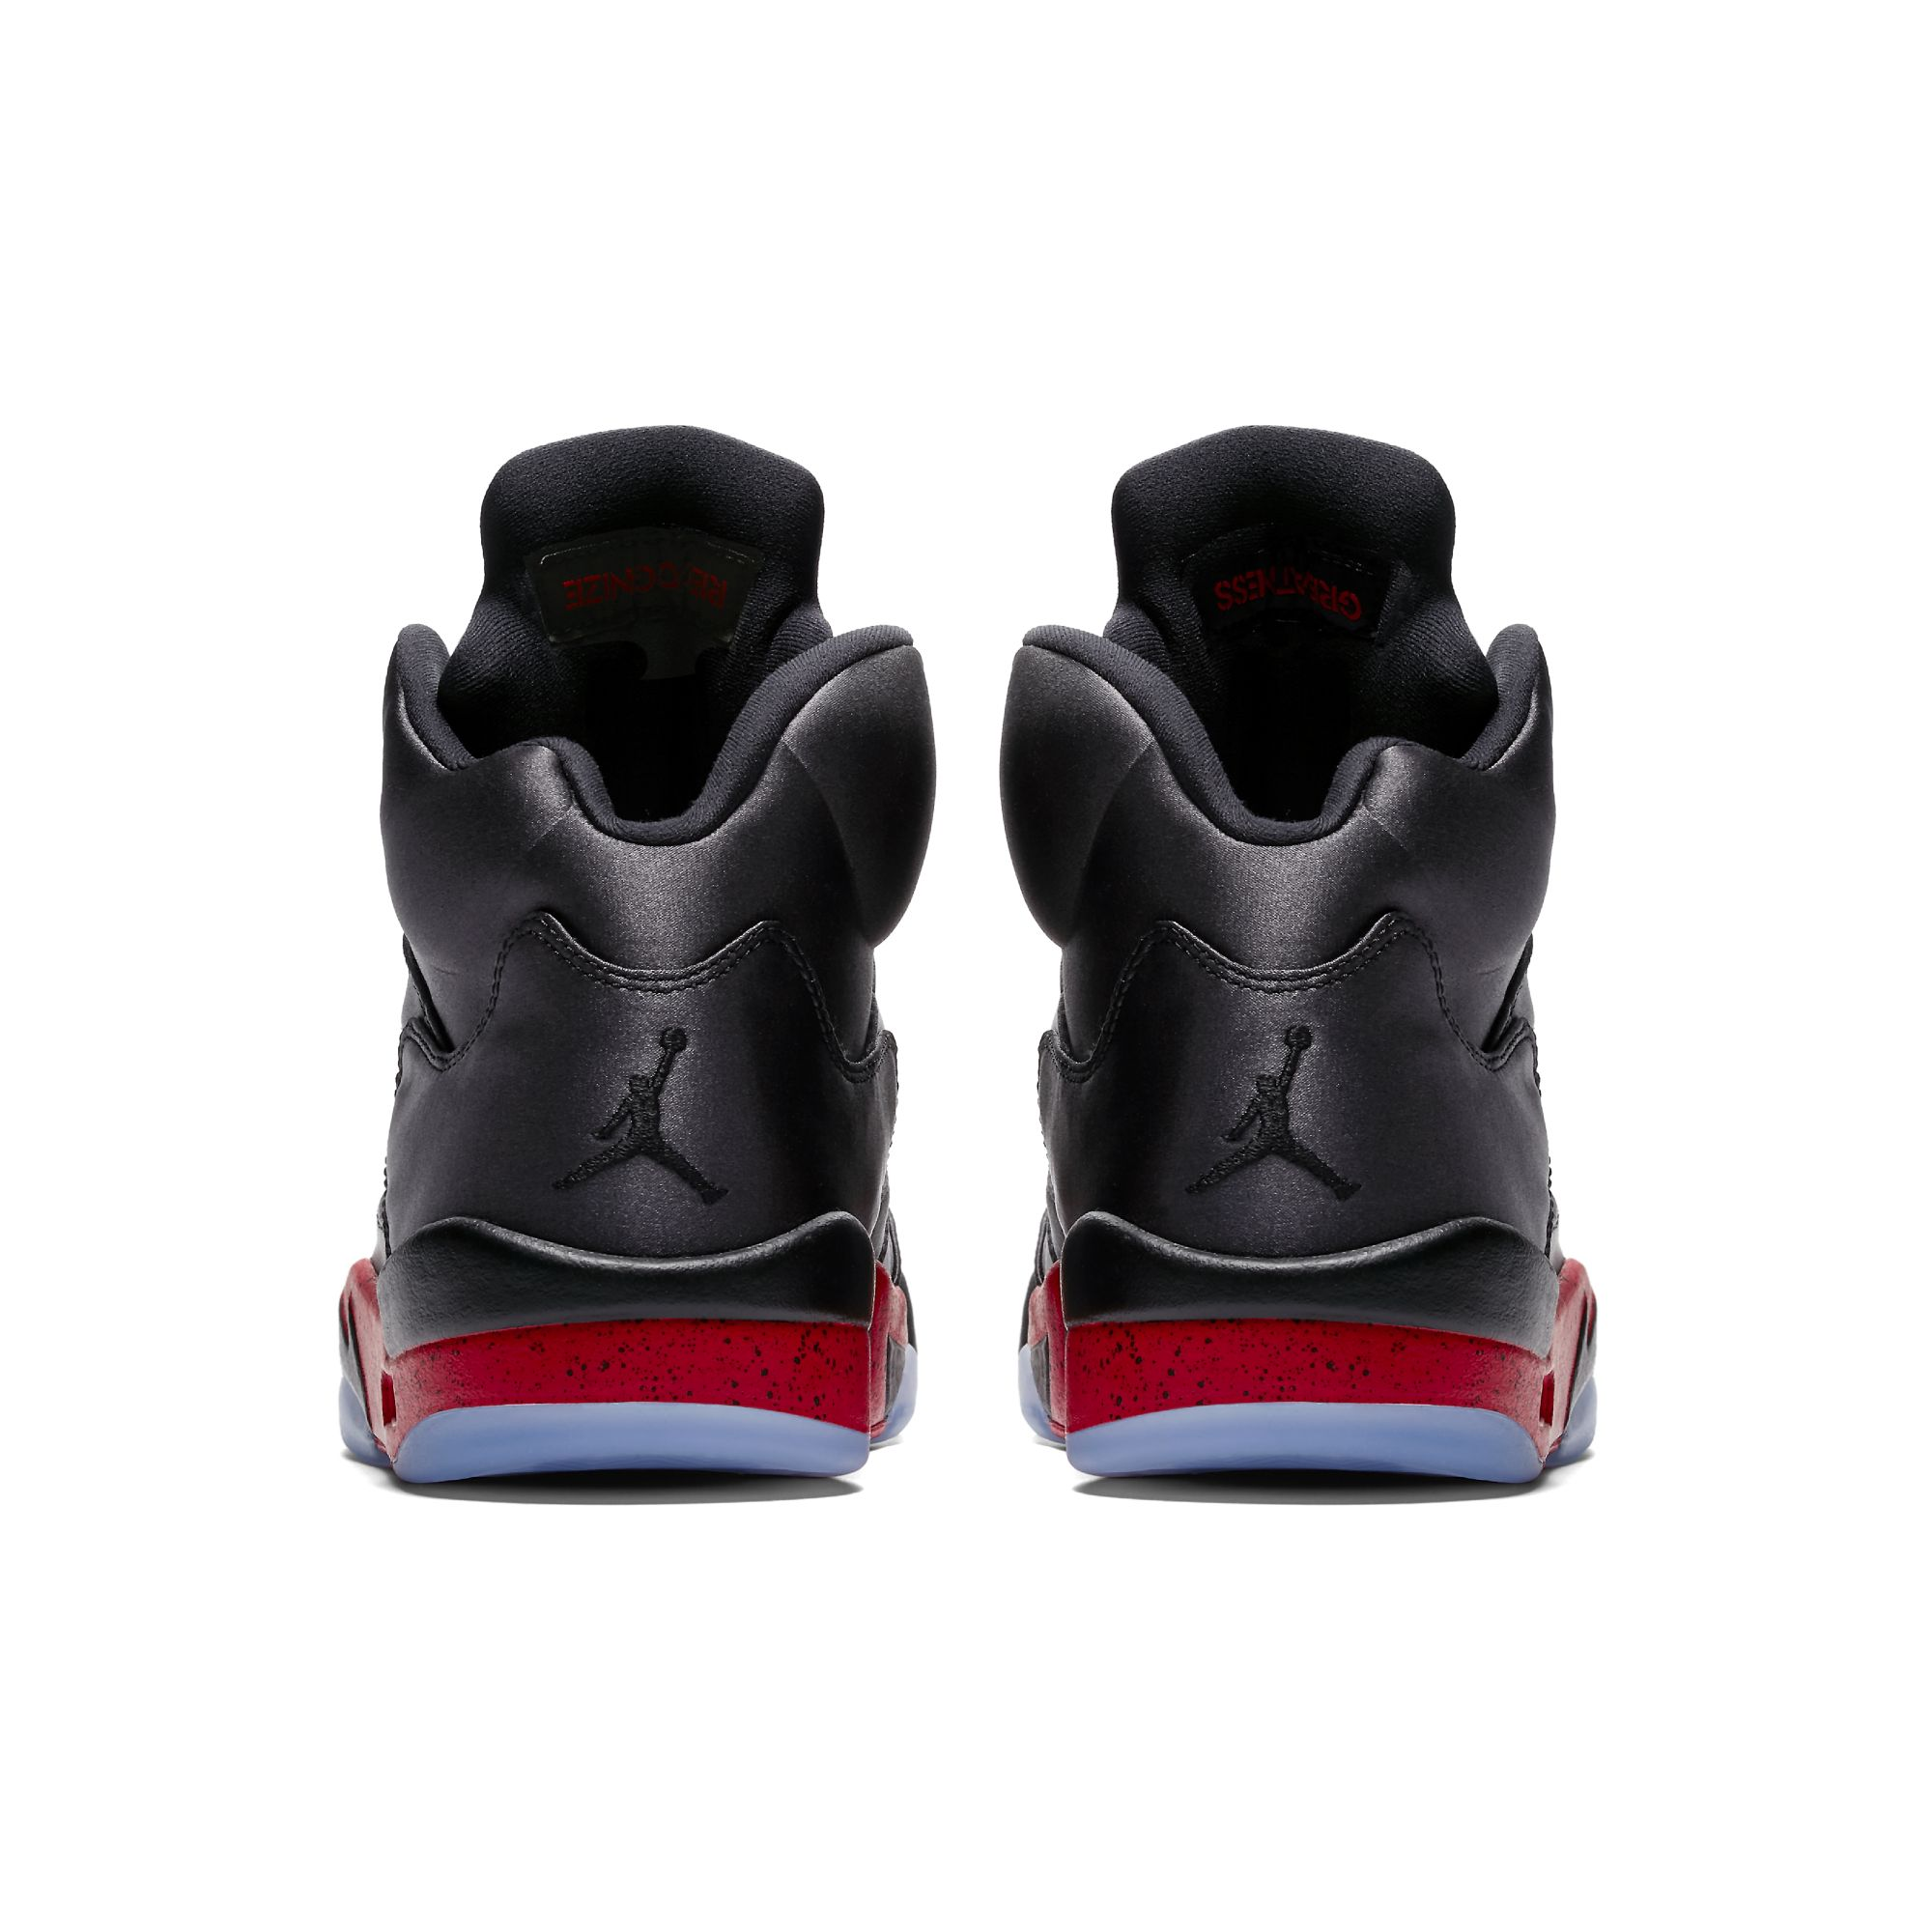 air jordan 5 satin black university red heel